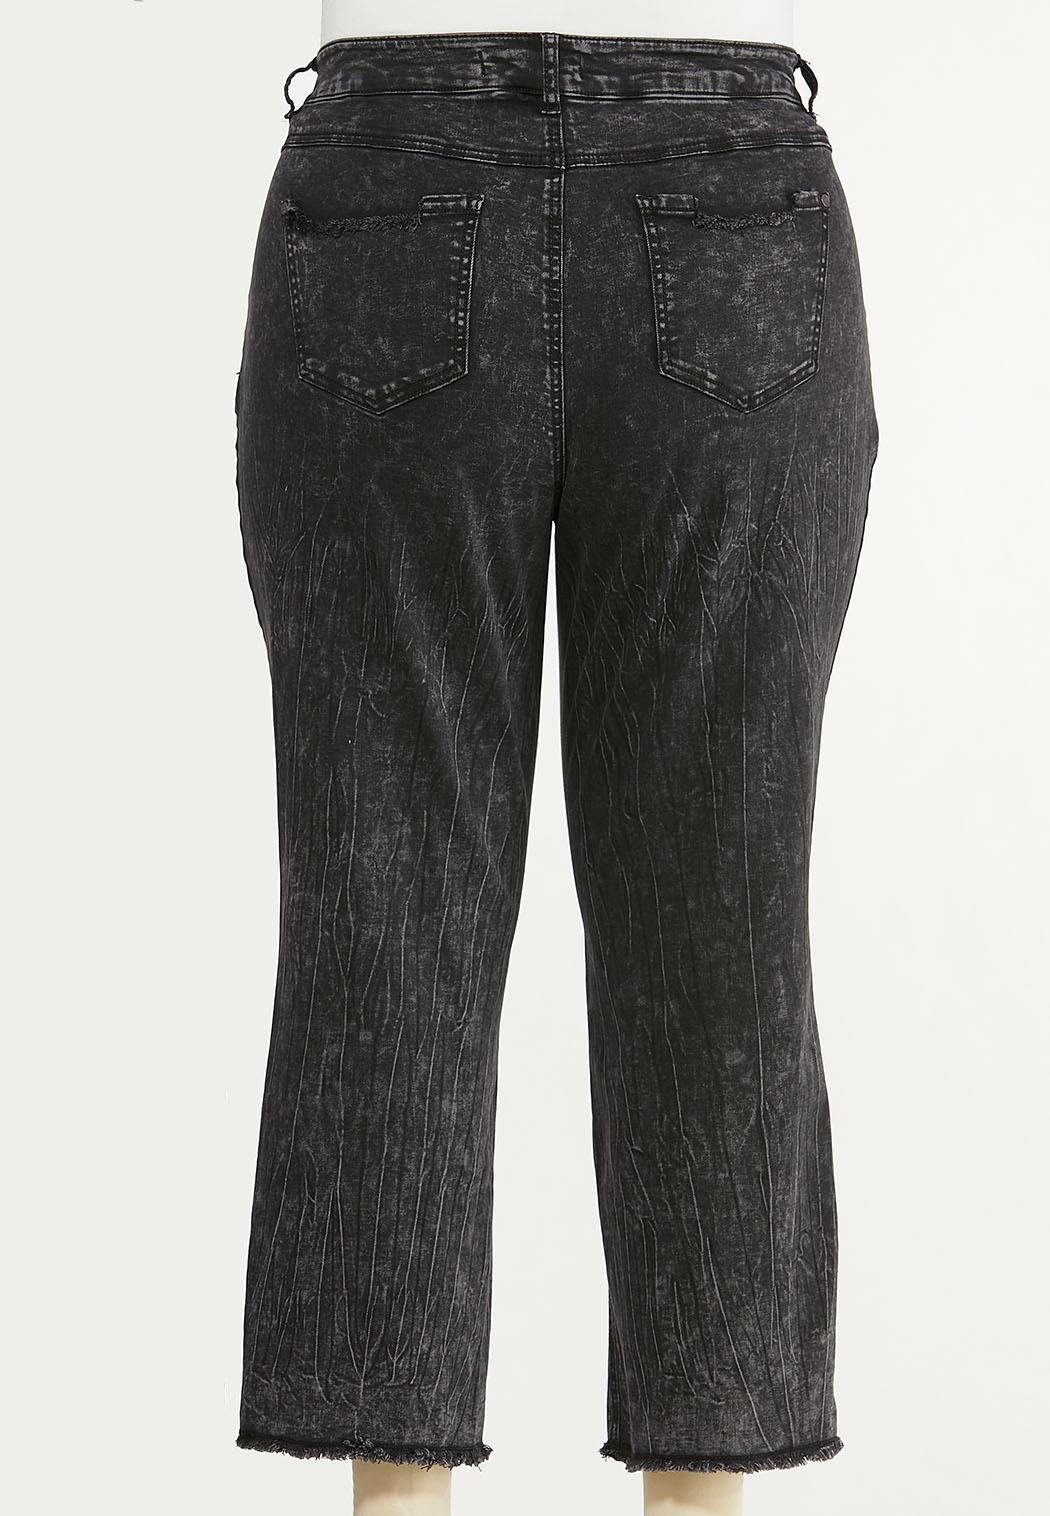 Plus Size Distressed Black Acid Wash Jeans (Item #44629474)